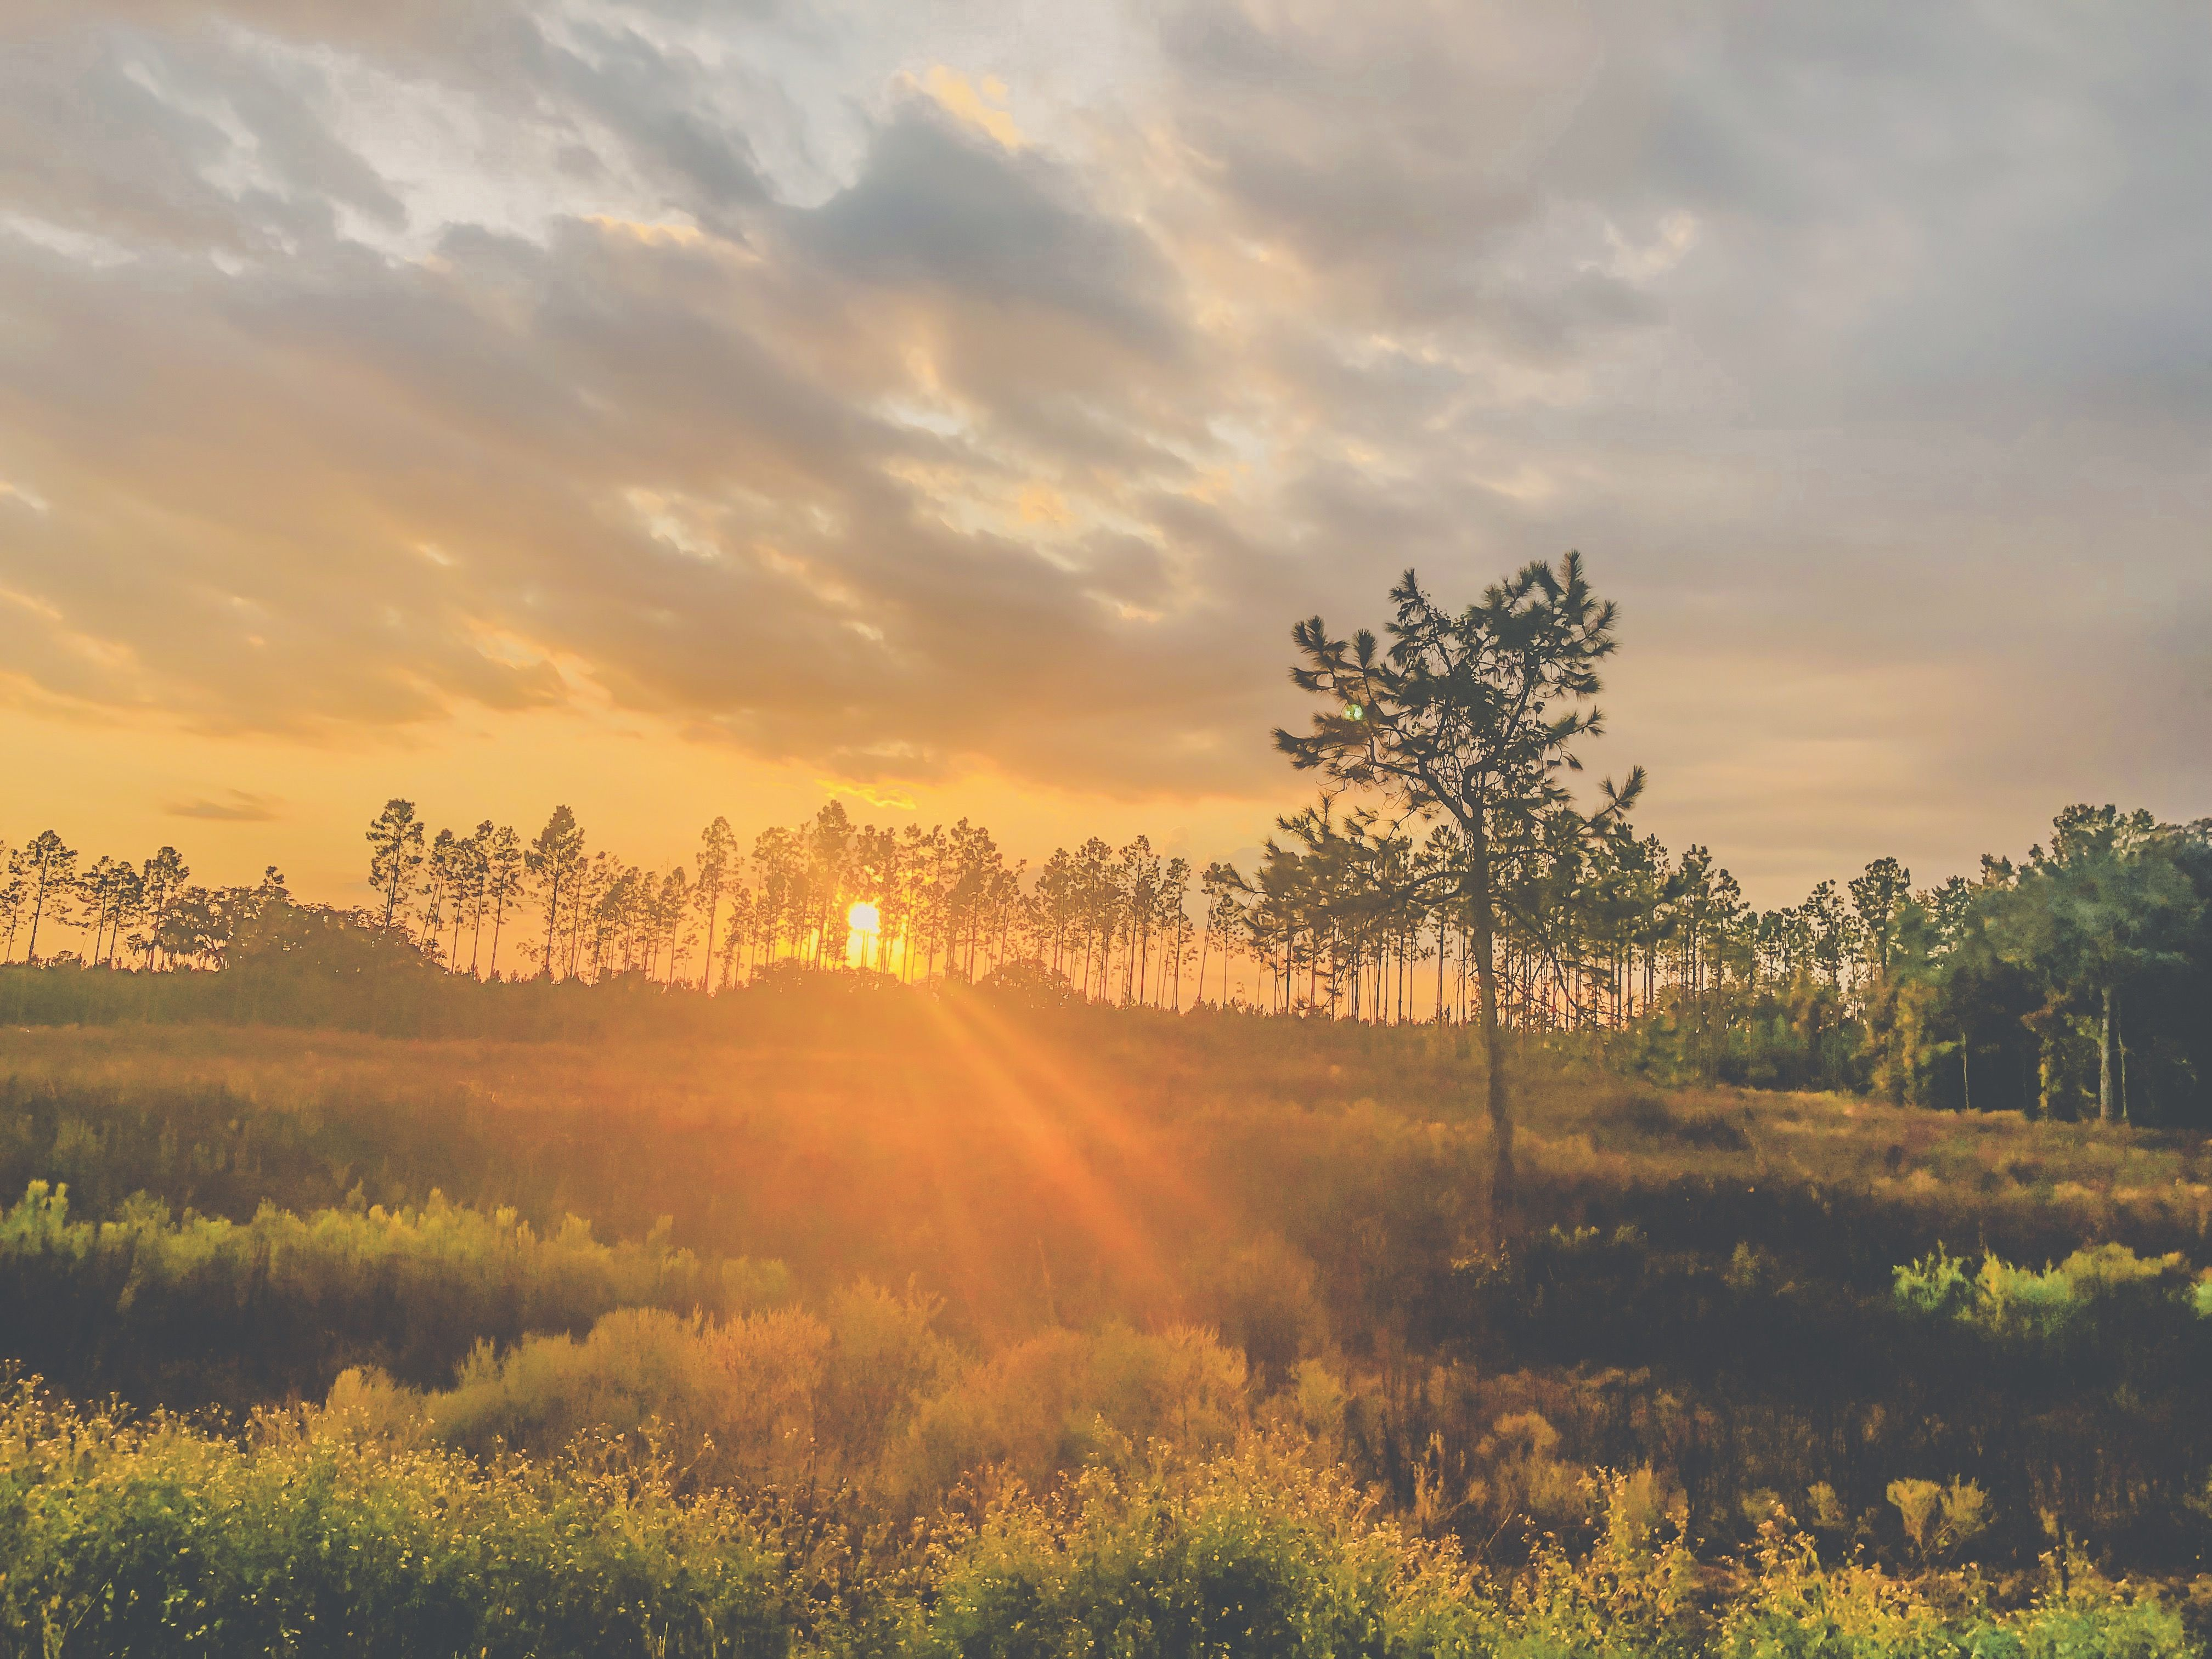 #sunset #photography #pinetree #sunsetphotography #sun #landscape #beautifulplaces #florida #floridaliving